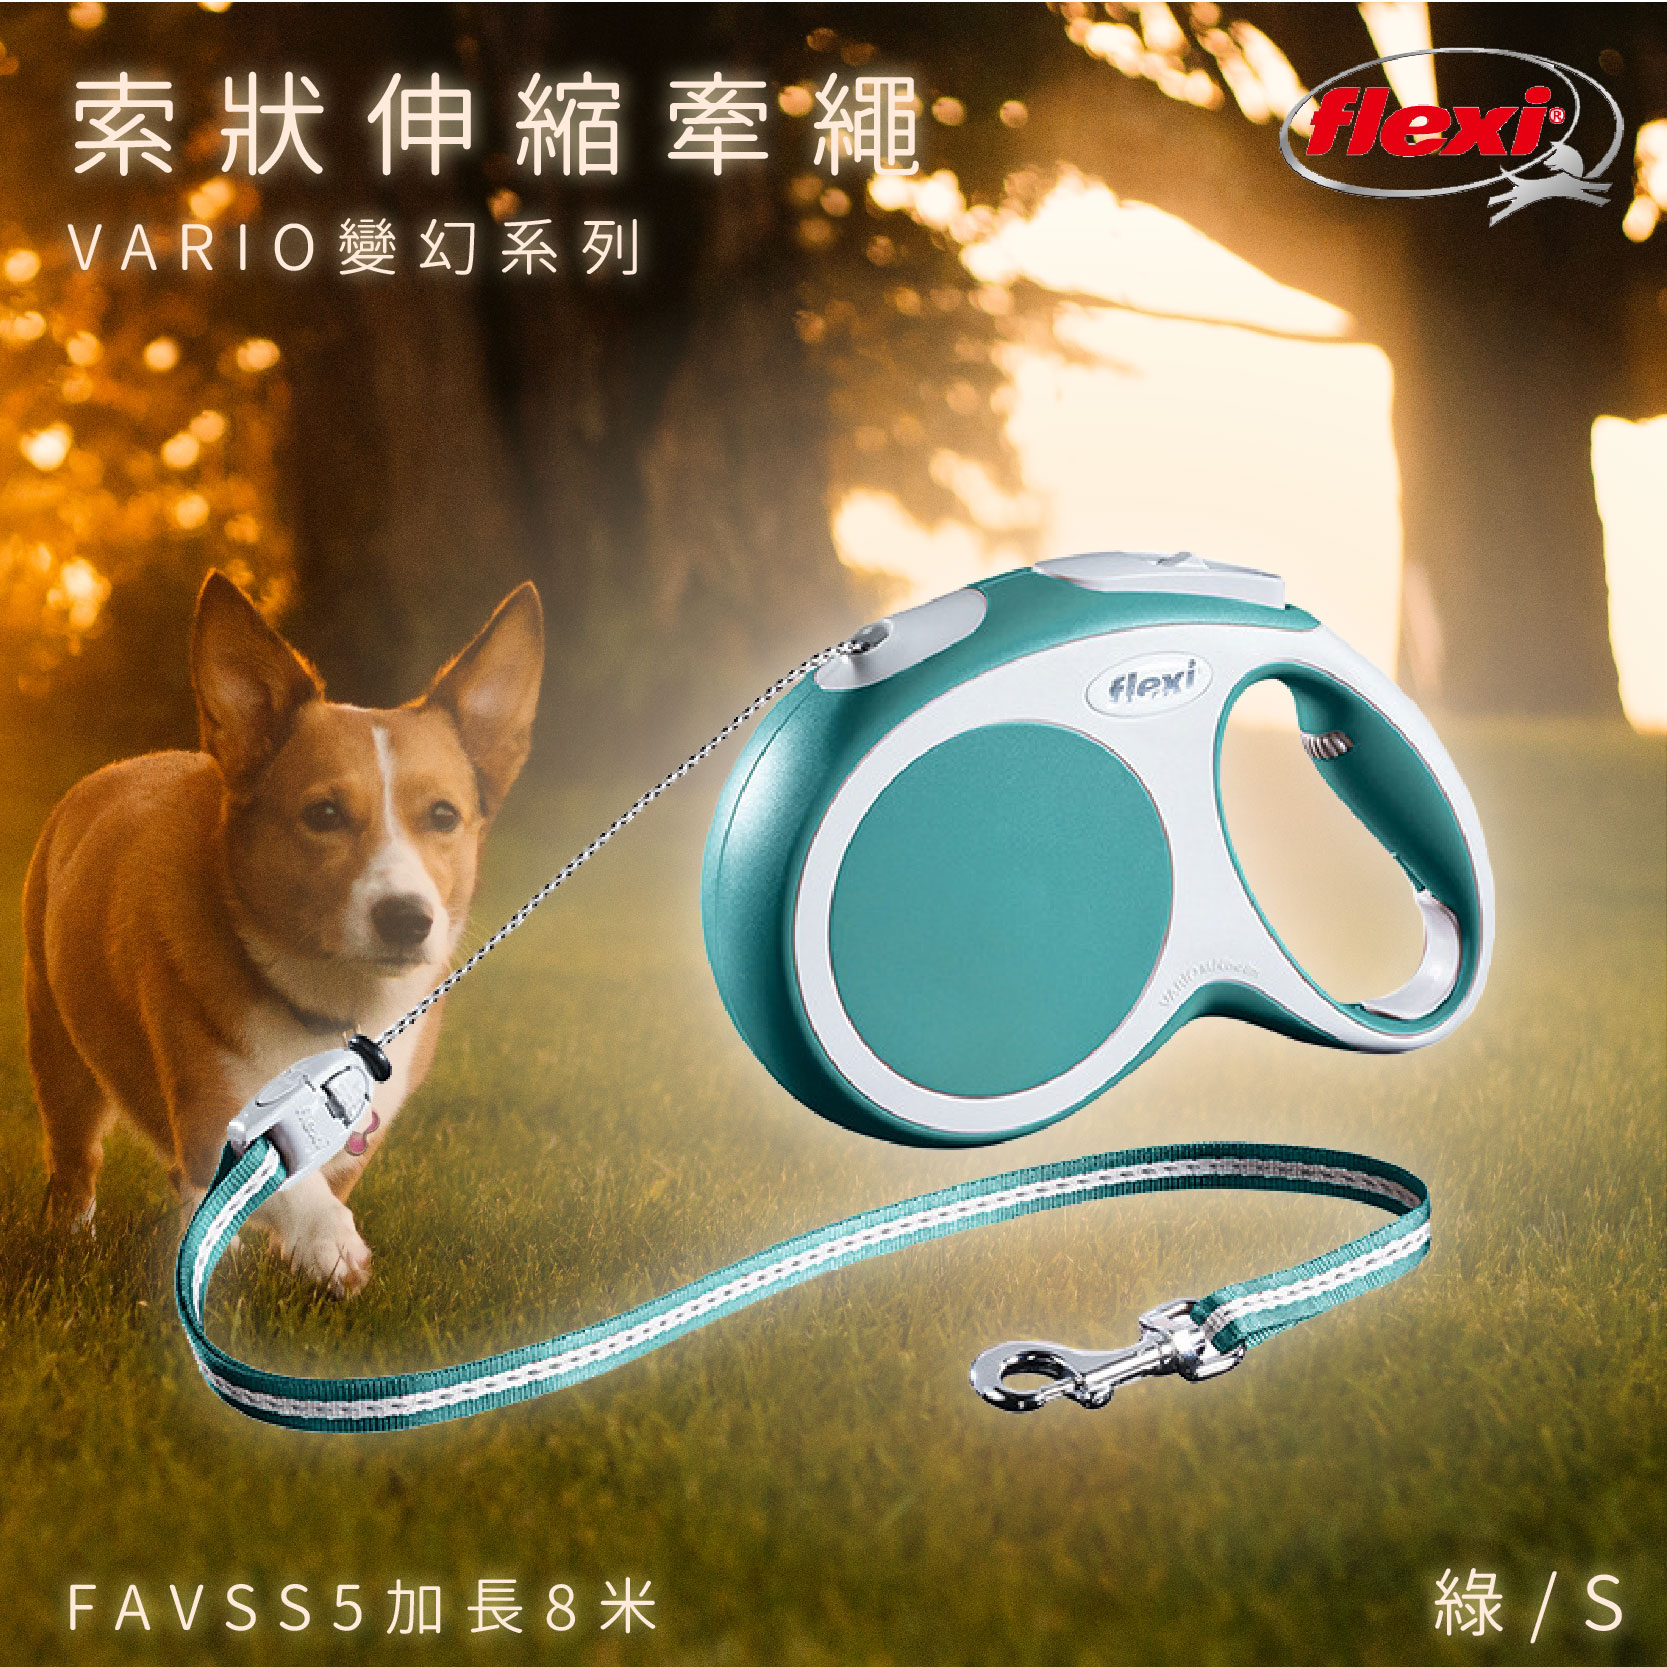 Flexi 索狀寵物牽繩 綠S加長8米 FAVSS5 變幻系列 狗貓 外出用品 寵物用品 寵物牽繩 德國製